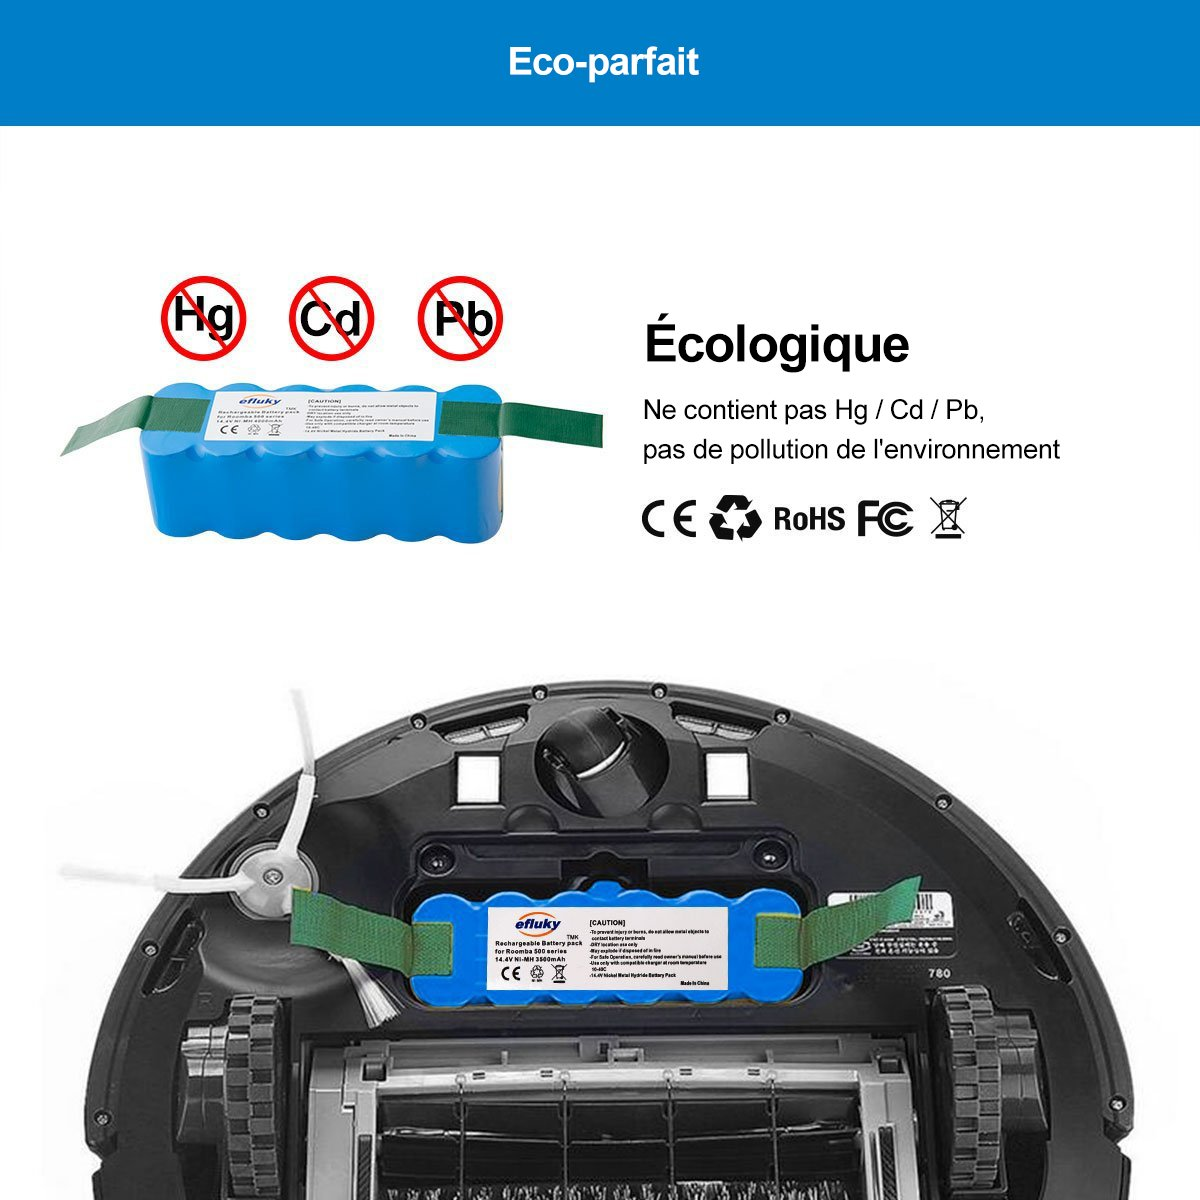 efluky 4.0Ah batería de Repuesto para irobot roomba + Kit cepillos repuestos de Accesorios para iRobot Roomba Serie 600 -un Conjunto DE 11: Amazon.es: Hogar